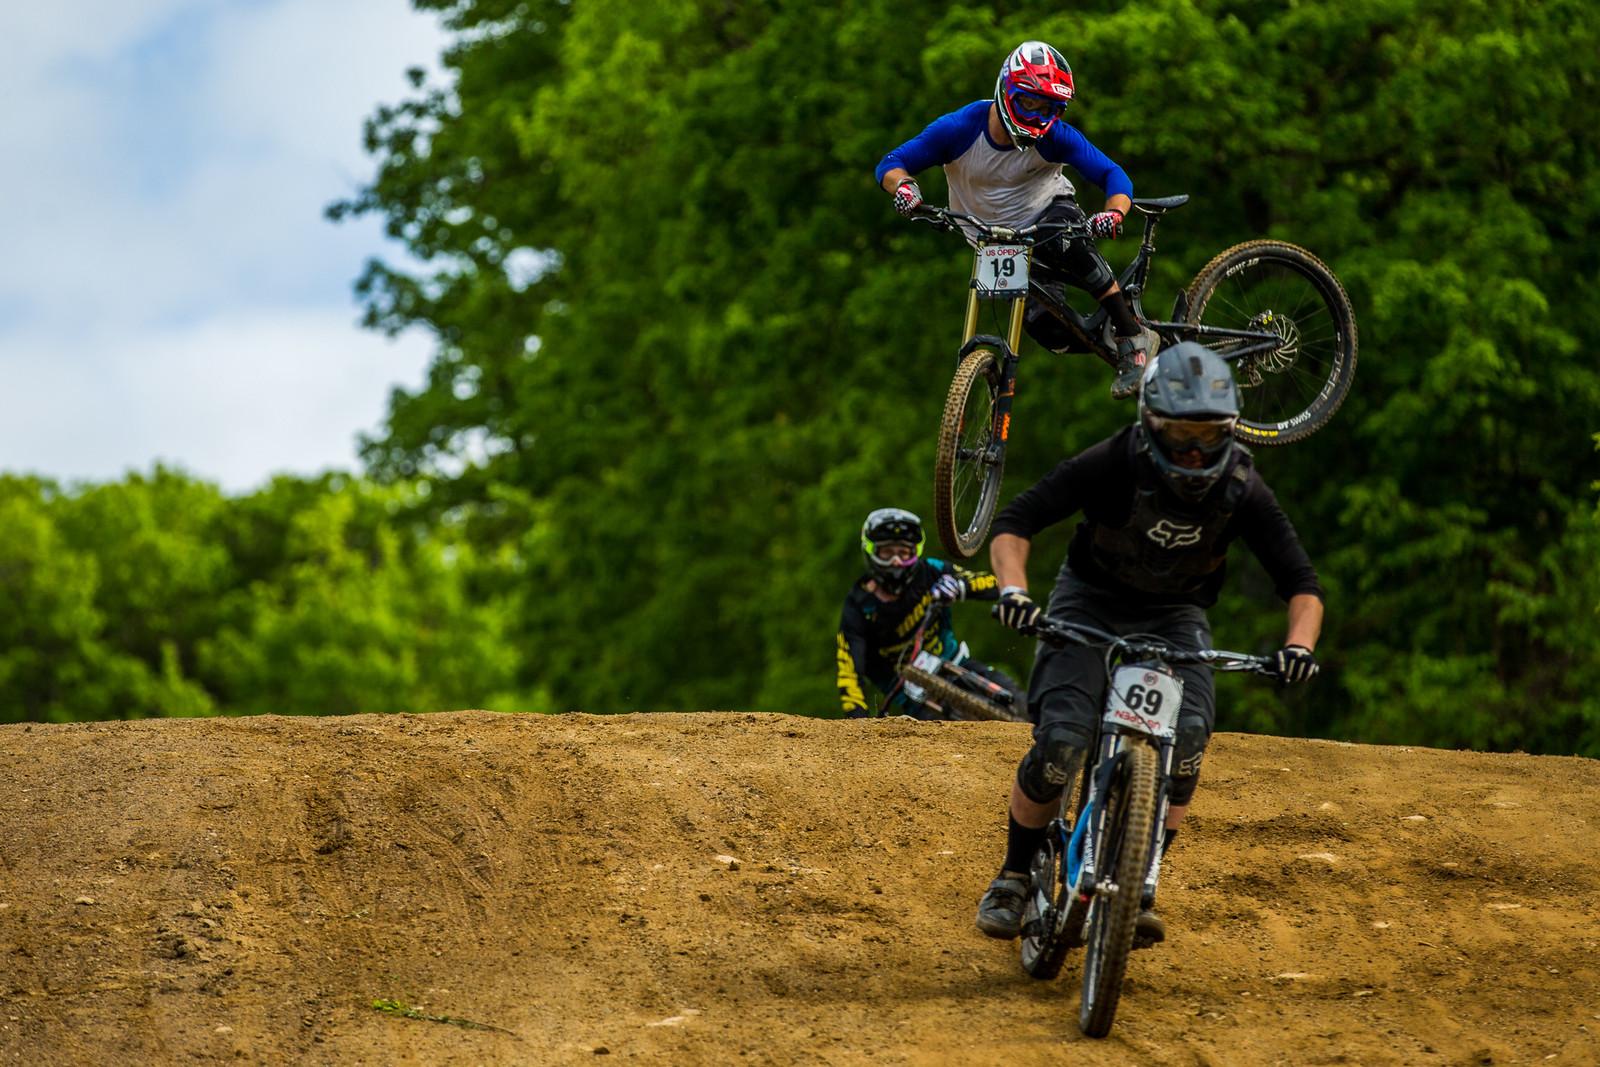 Lucas Cowan - US Open Whip Off! - Mountain Biking Pictures - Vital MTB